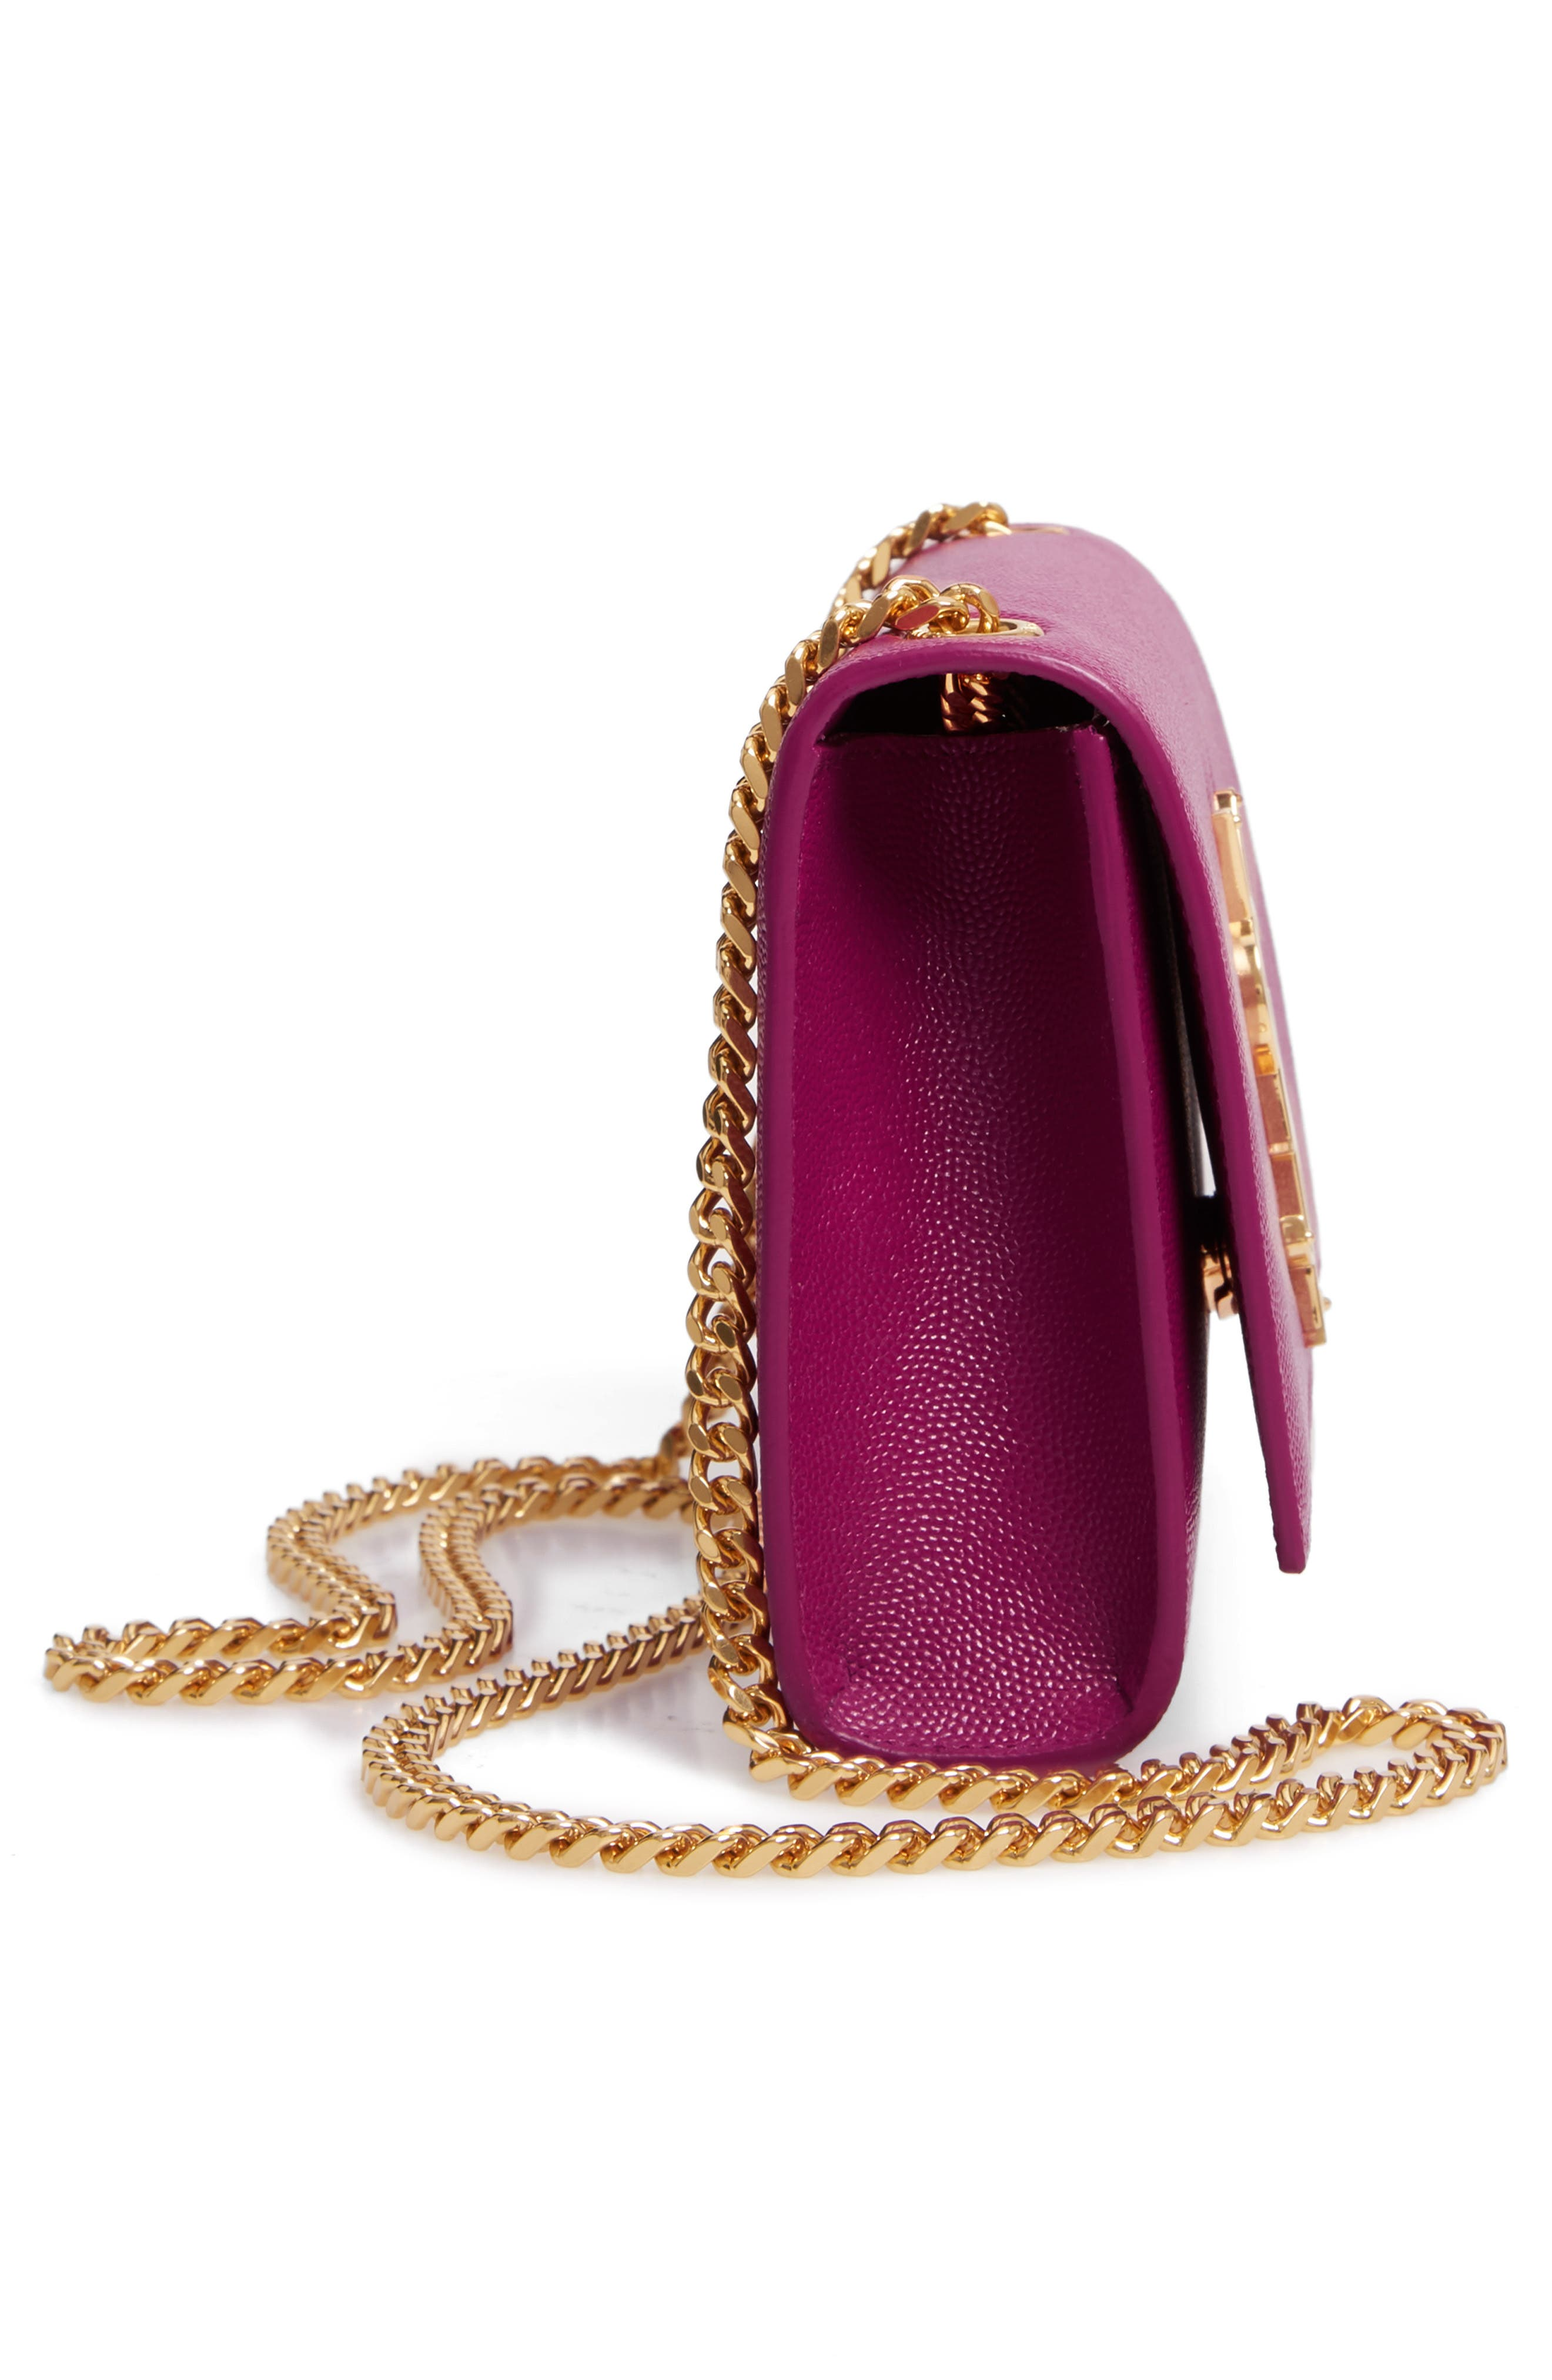 SAINT LAURENT, Small Kate Chain Crossbody Bag, Alternate thumbnail 5, color, LIGHT GRAPE